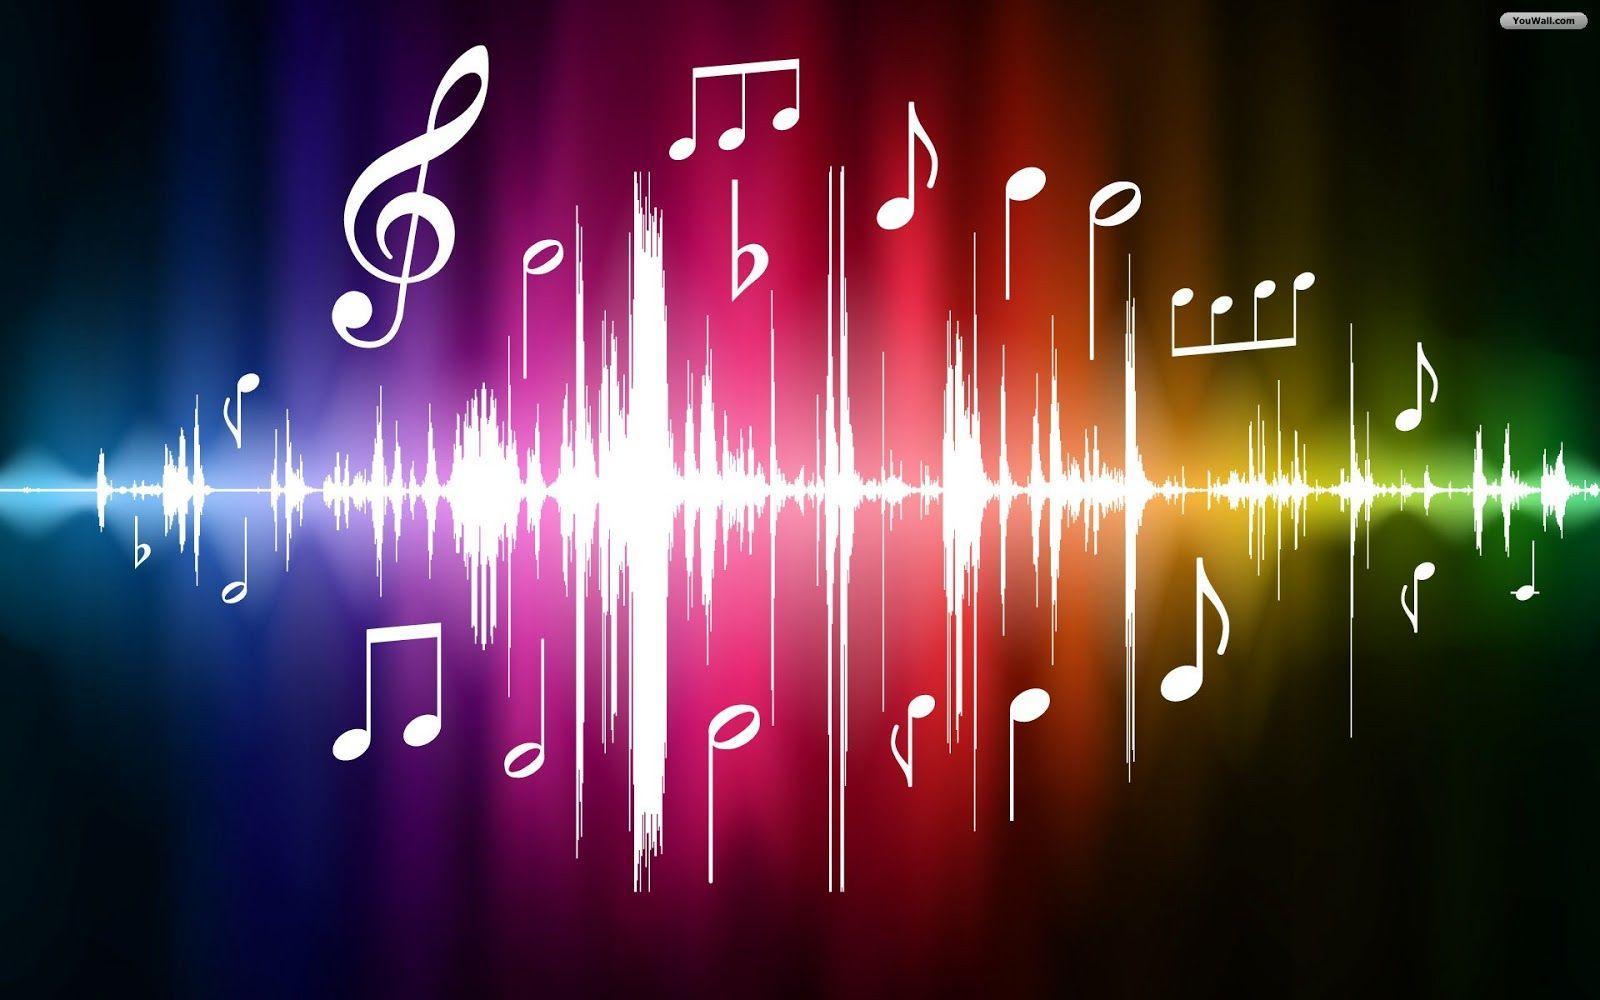 Good Wallpaper Music Desktop - w0Gu6Nm  Collection_85655.jpg